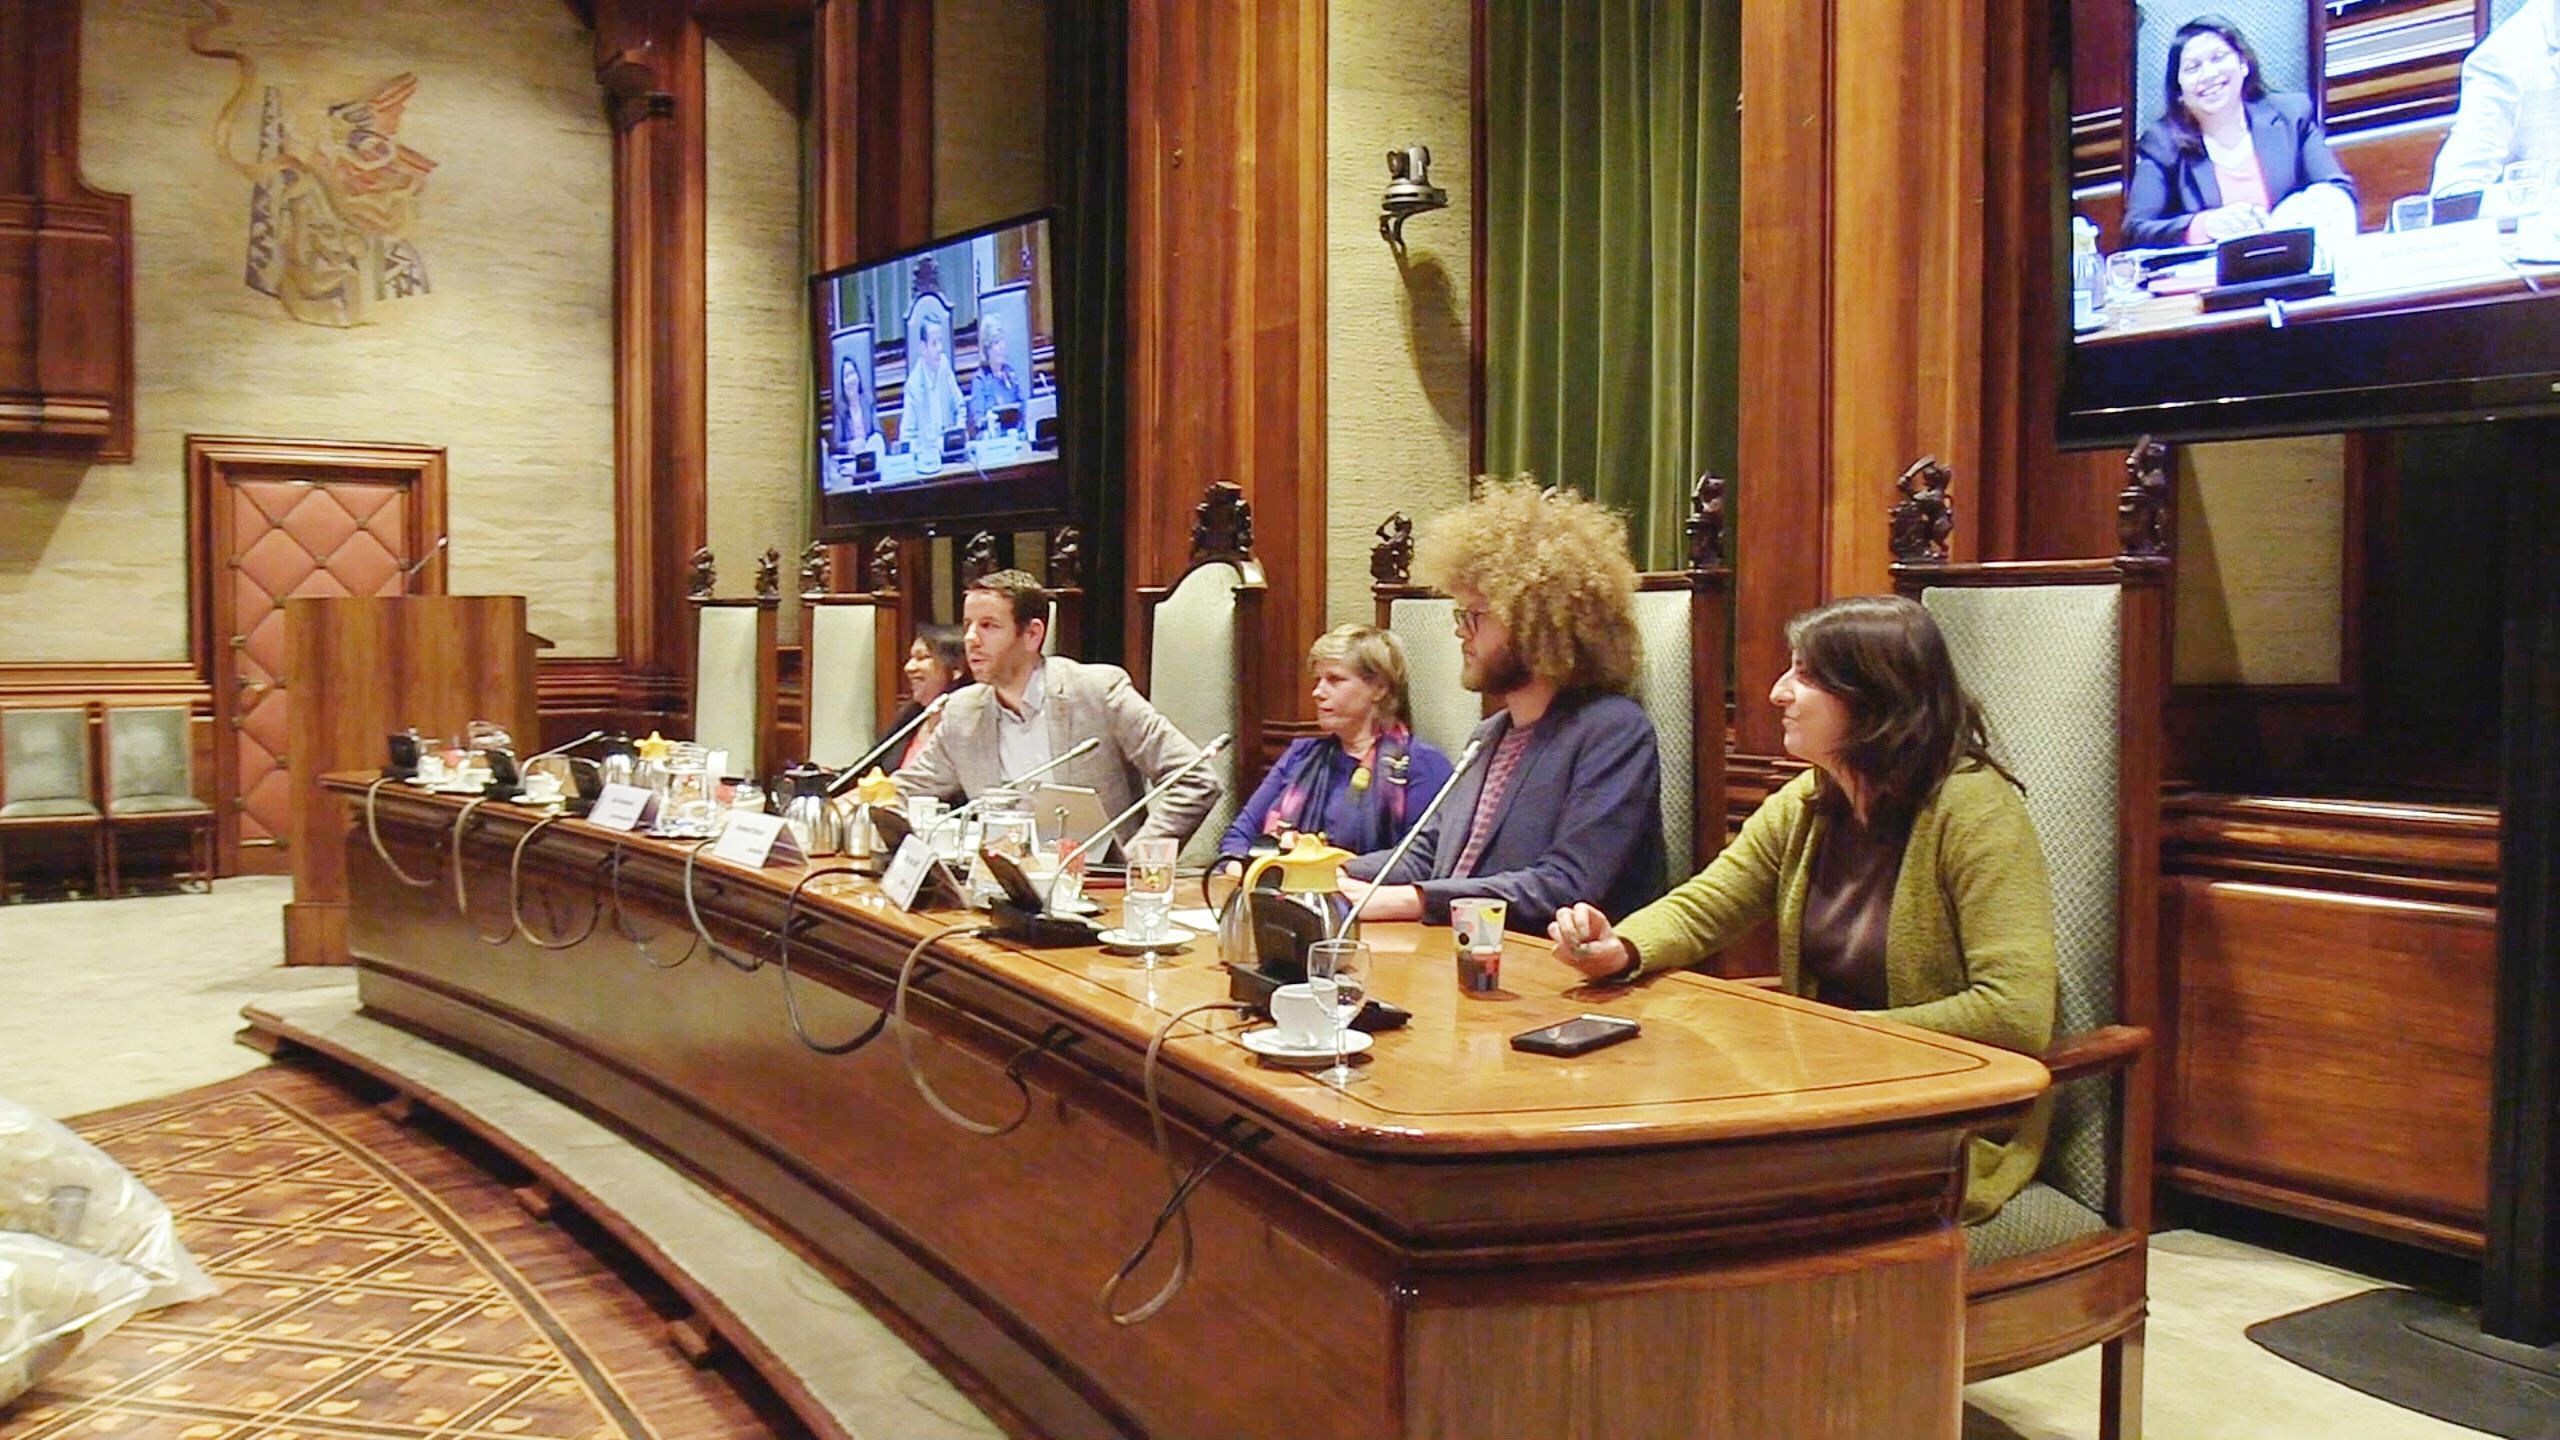 Canalcups-activisten vieren overwinning met documentaire